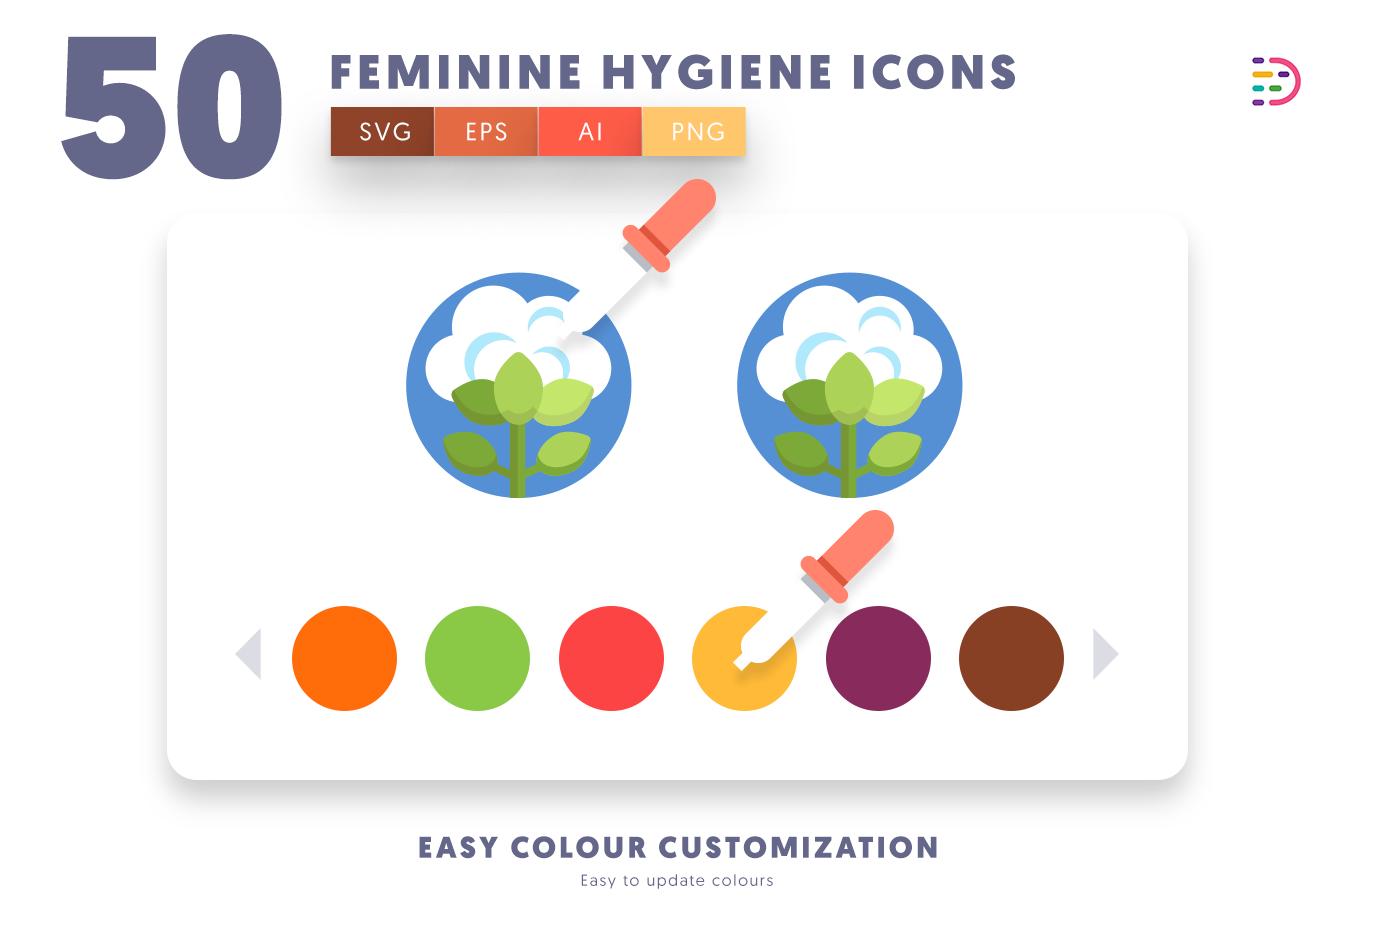 Customizable and vector 50 Feminine Hygiene Icons